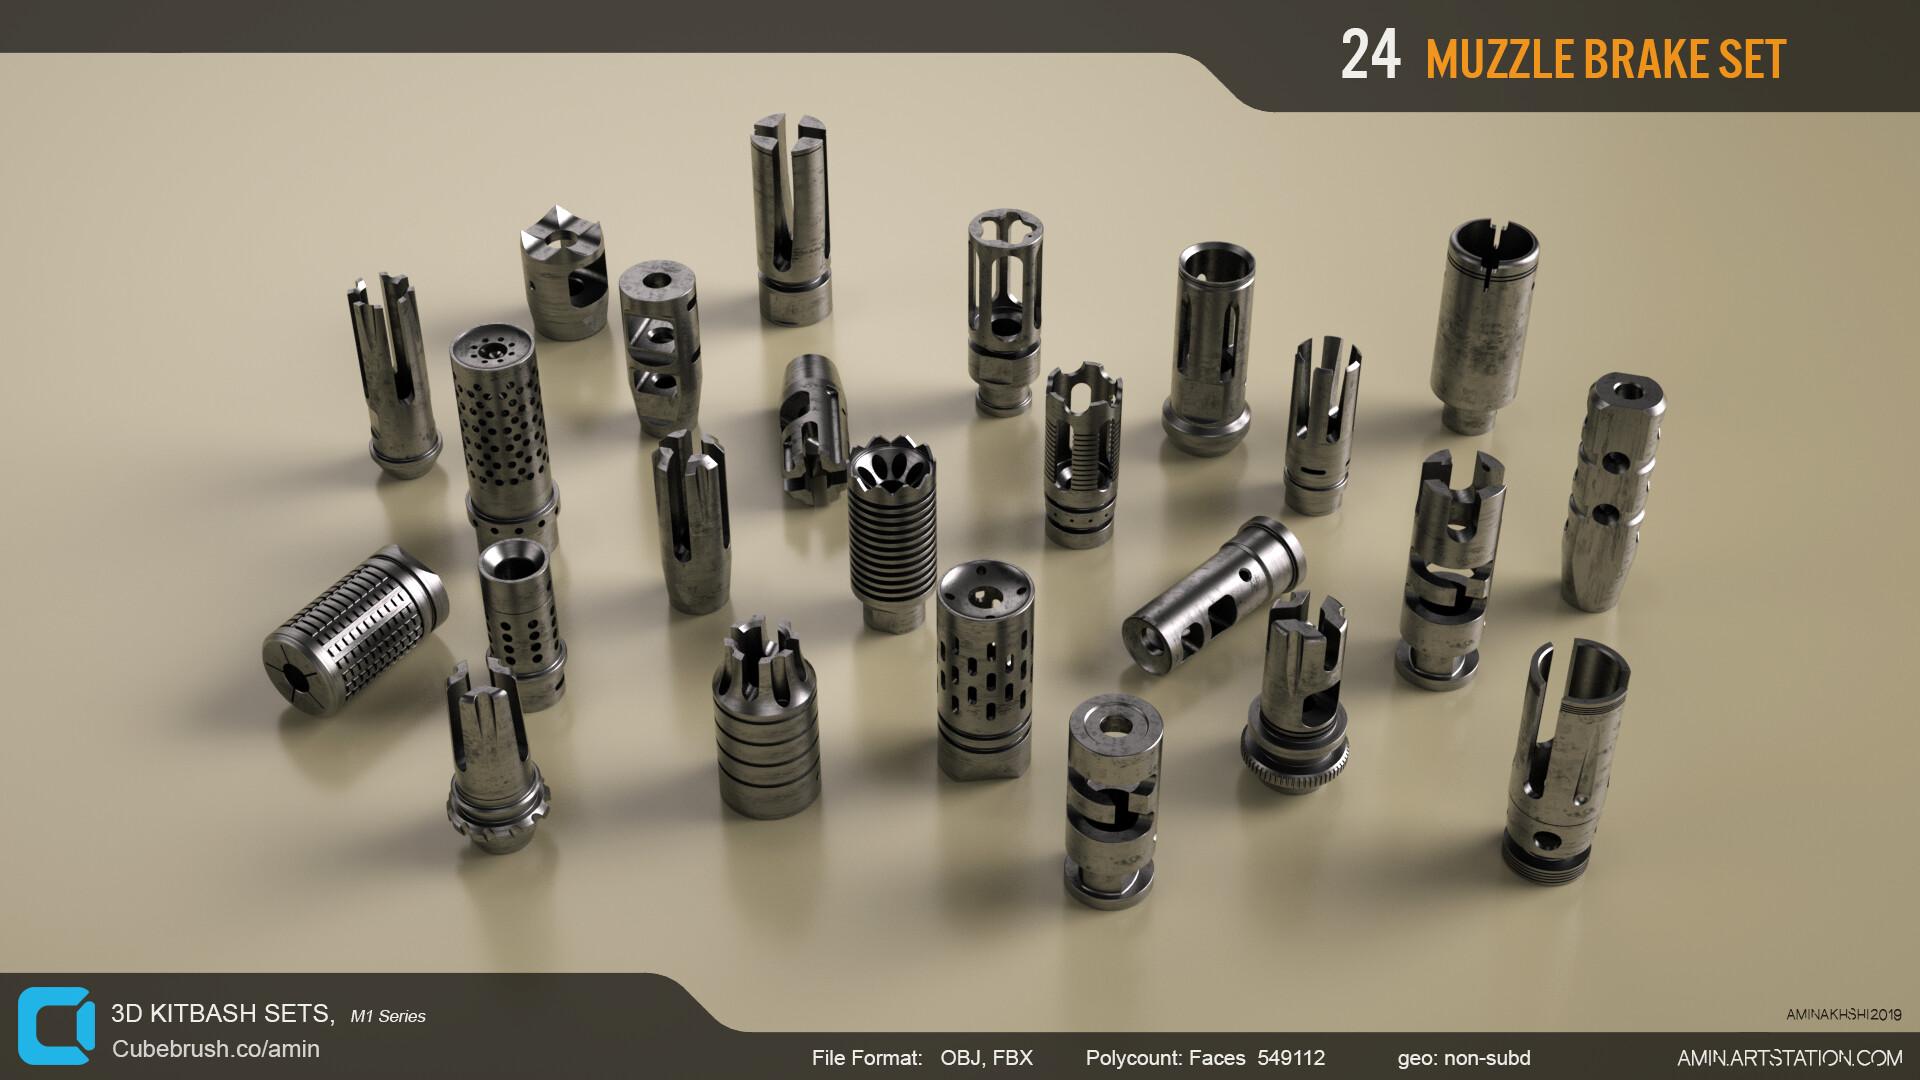 Amin akhshi 001 muzzle brakes set